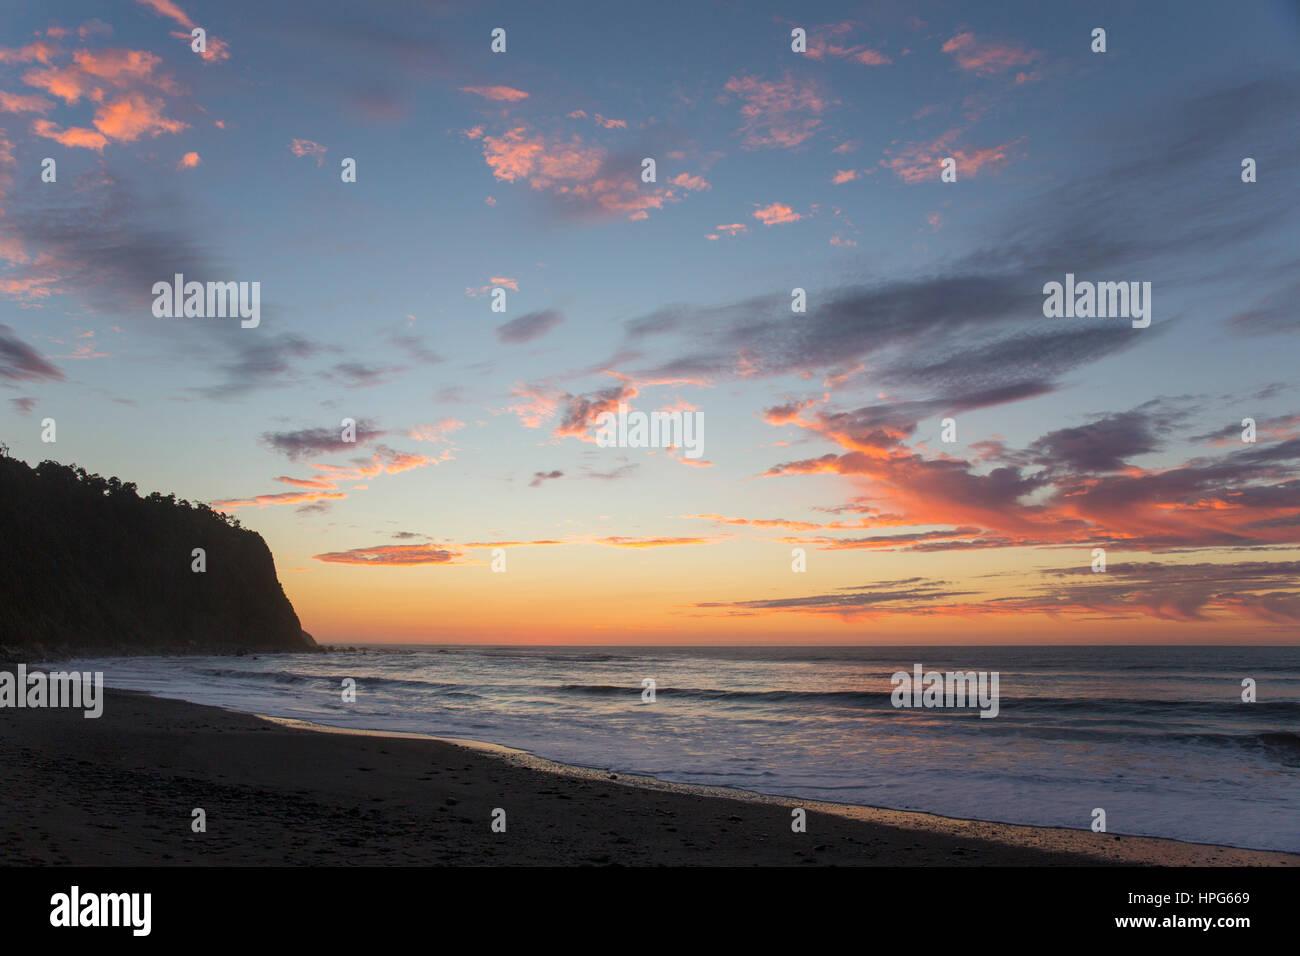 Okarito, Westland Tai Poutini National Park, West Coast, New Zealand. Colourful sky over the Tasman Sea, dusk. Stock Photo